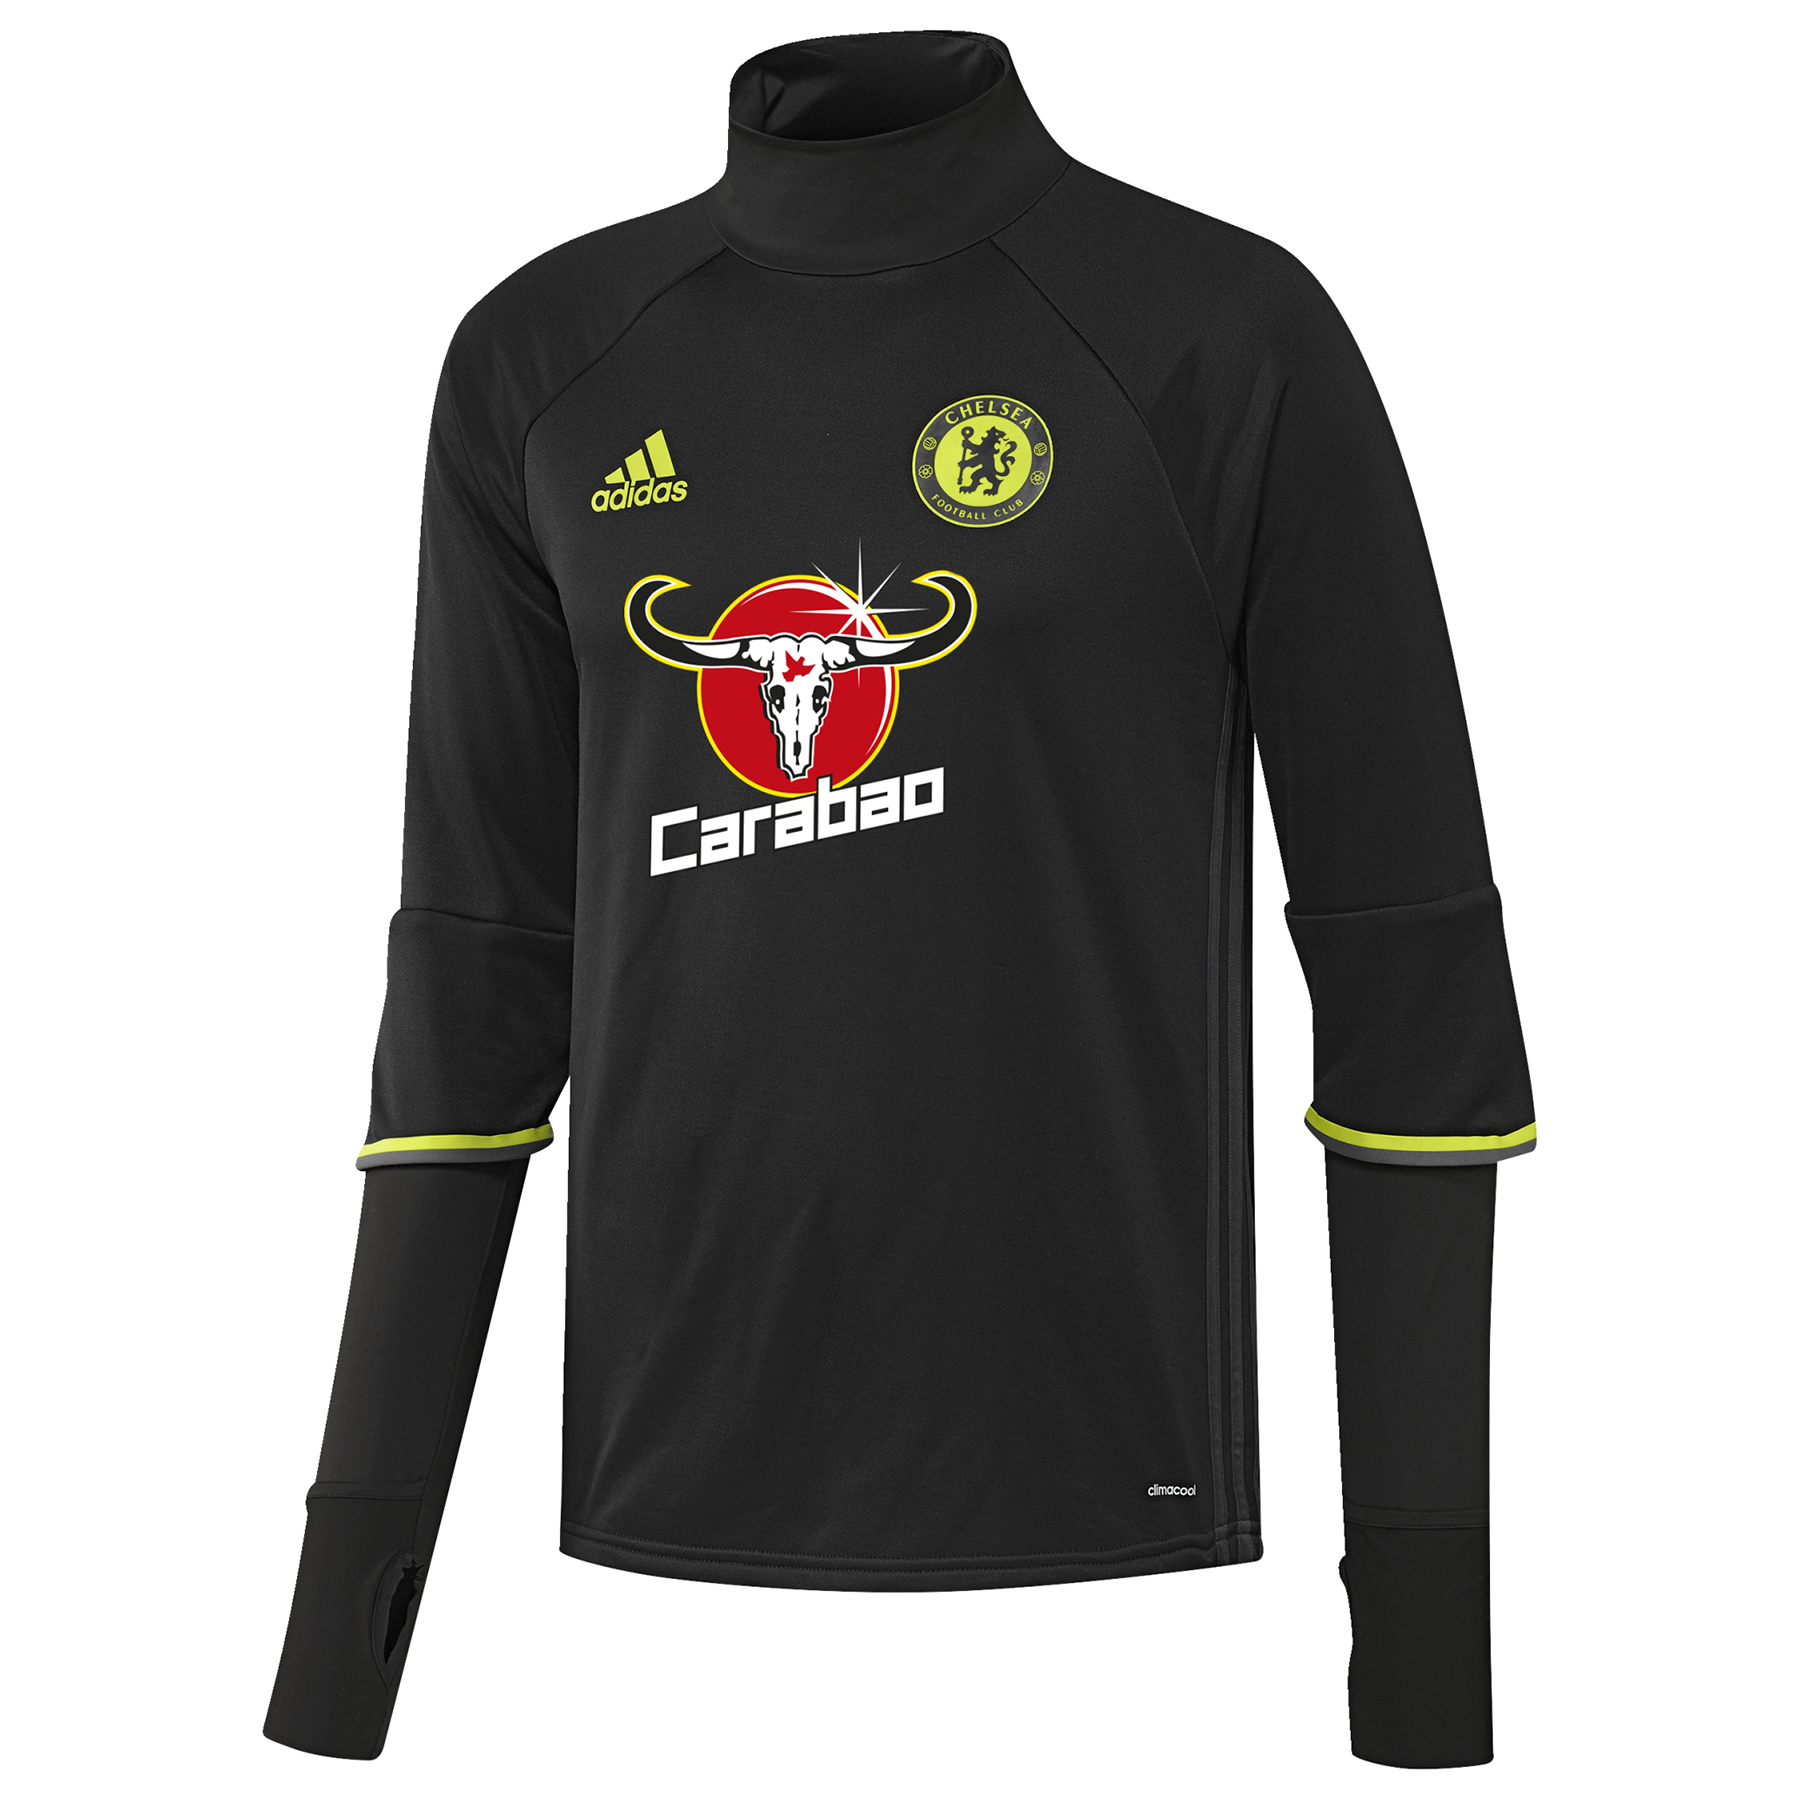 Chelsea Training Top - Black